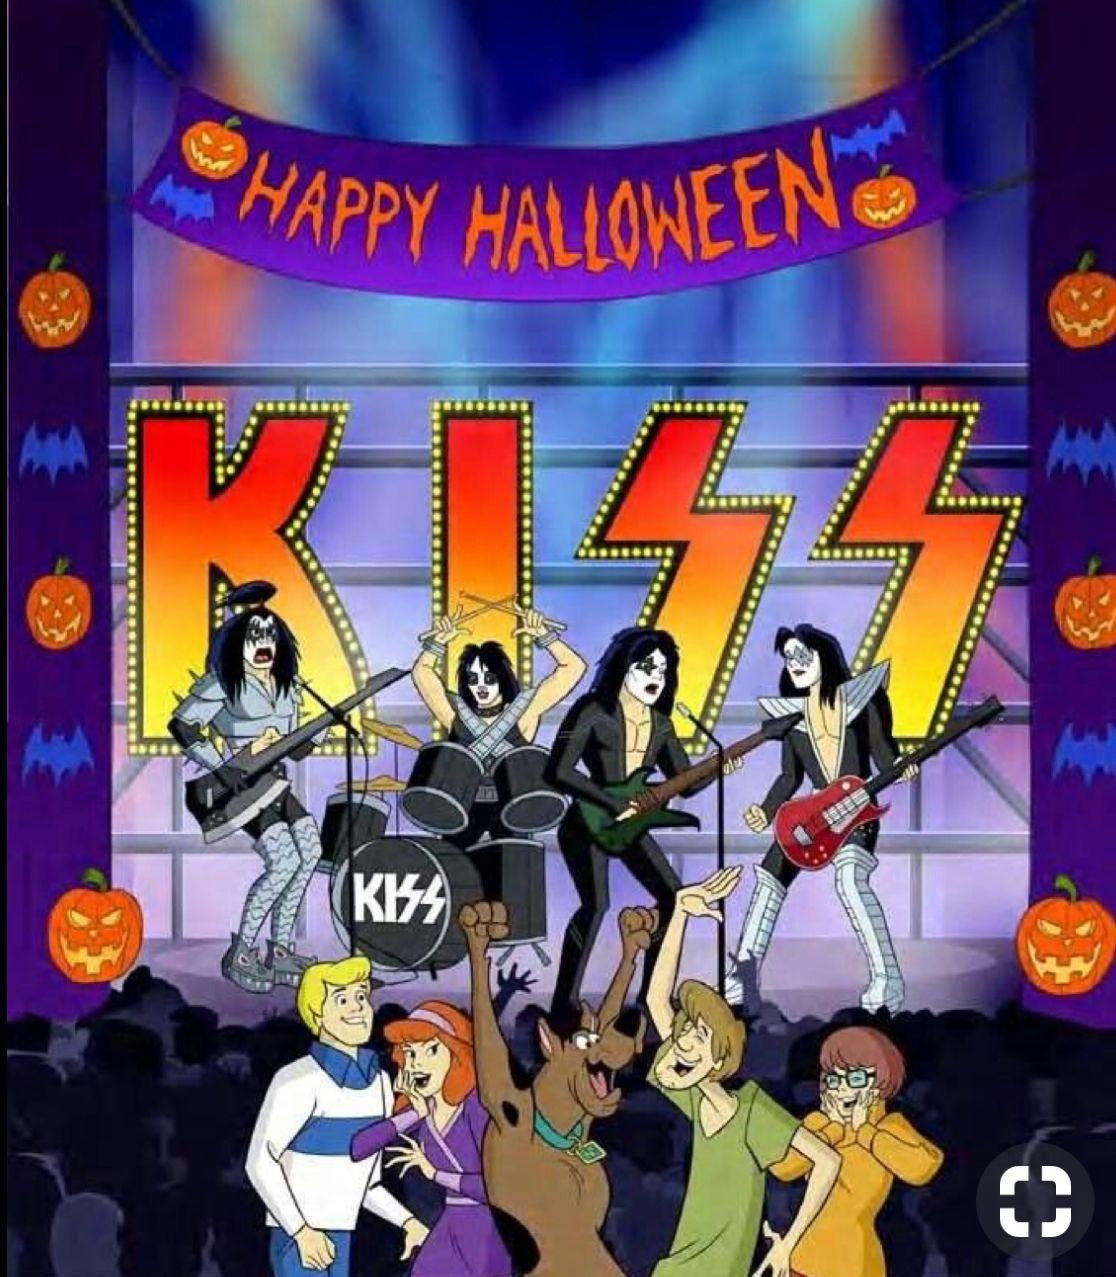 Scooby Doo Scooby doo halloween, Scooby doo mystery